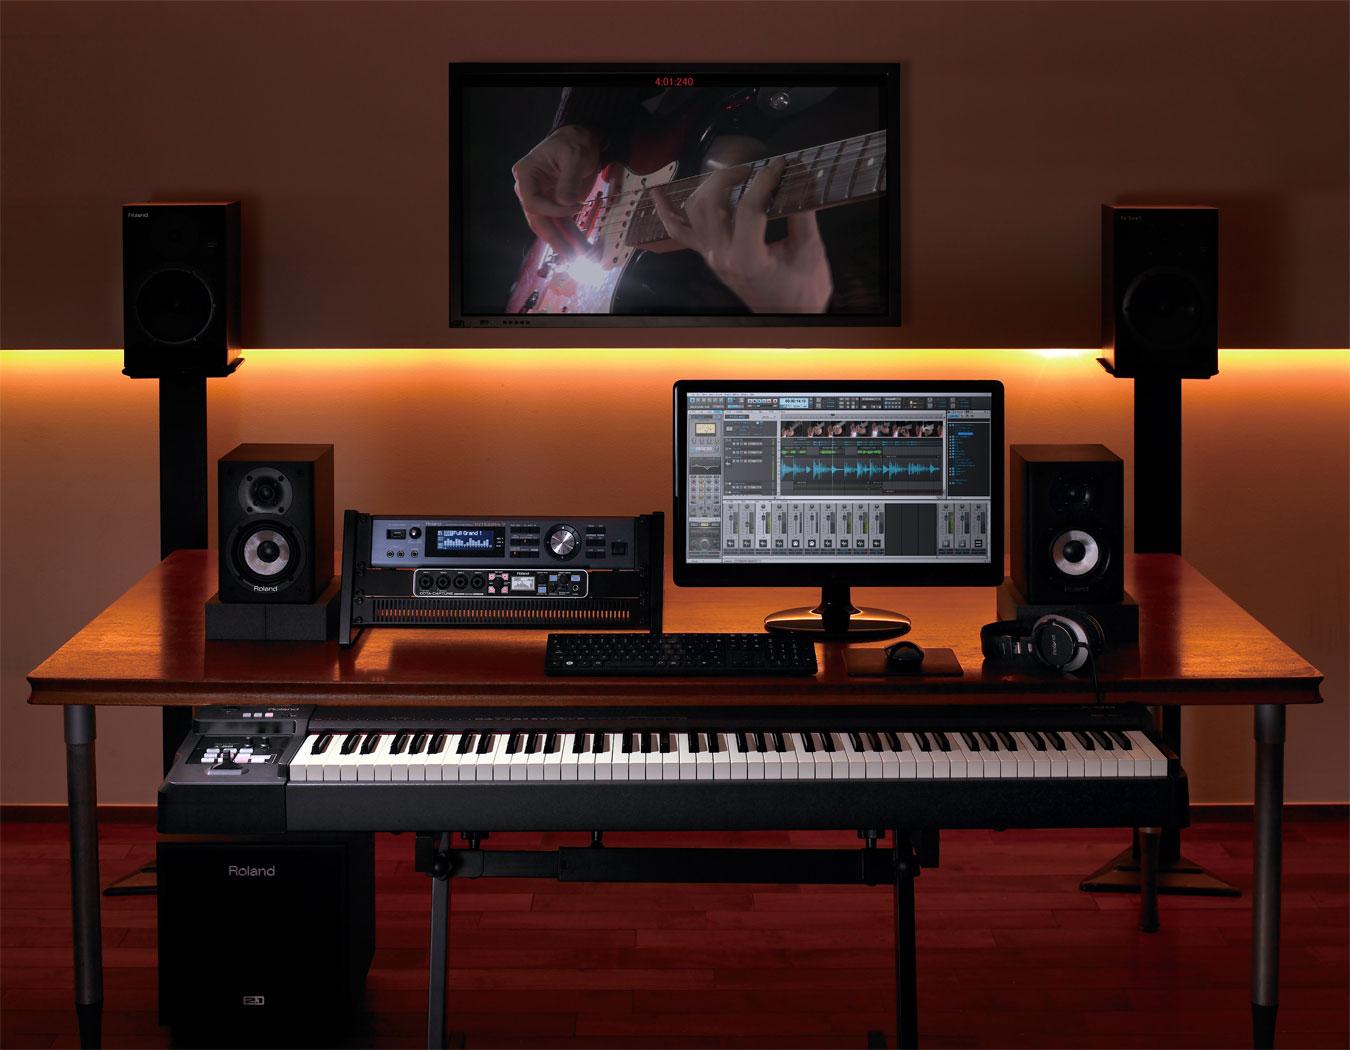 computer setup with piano